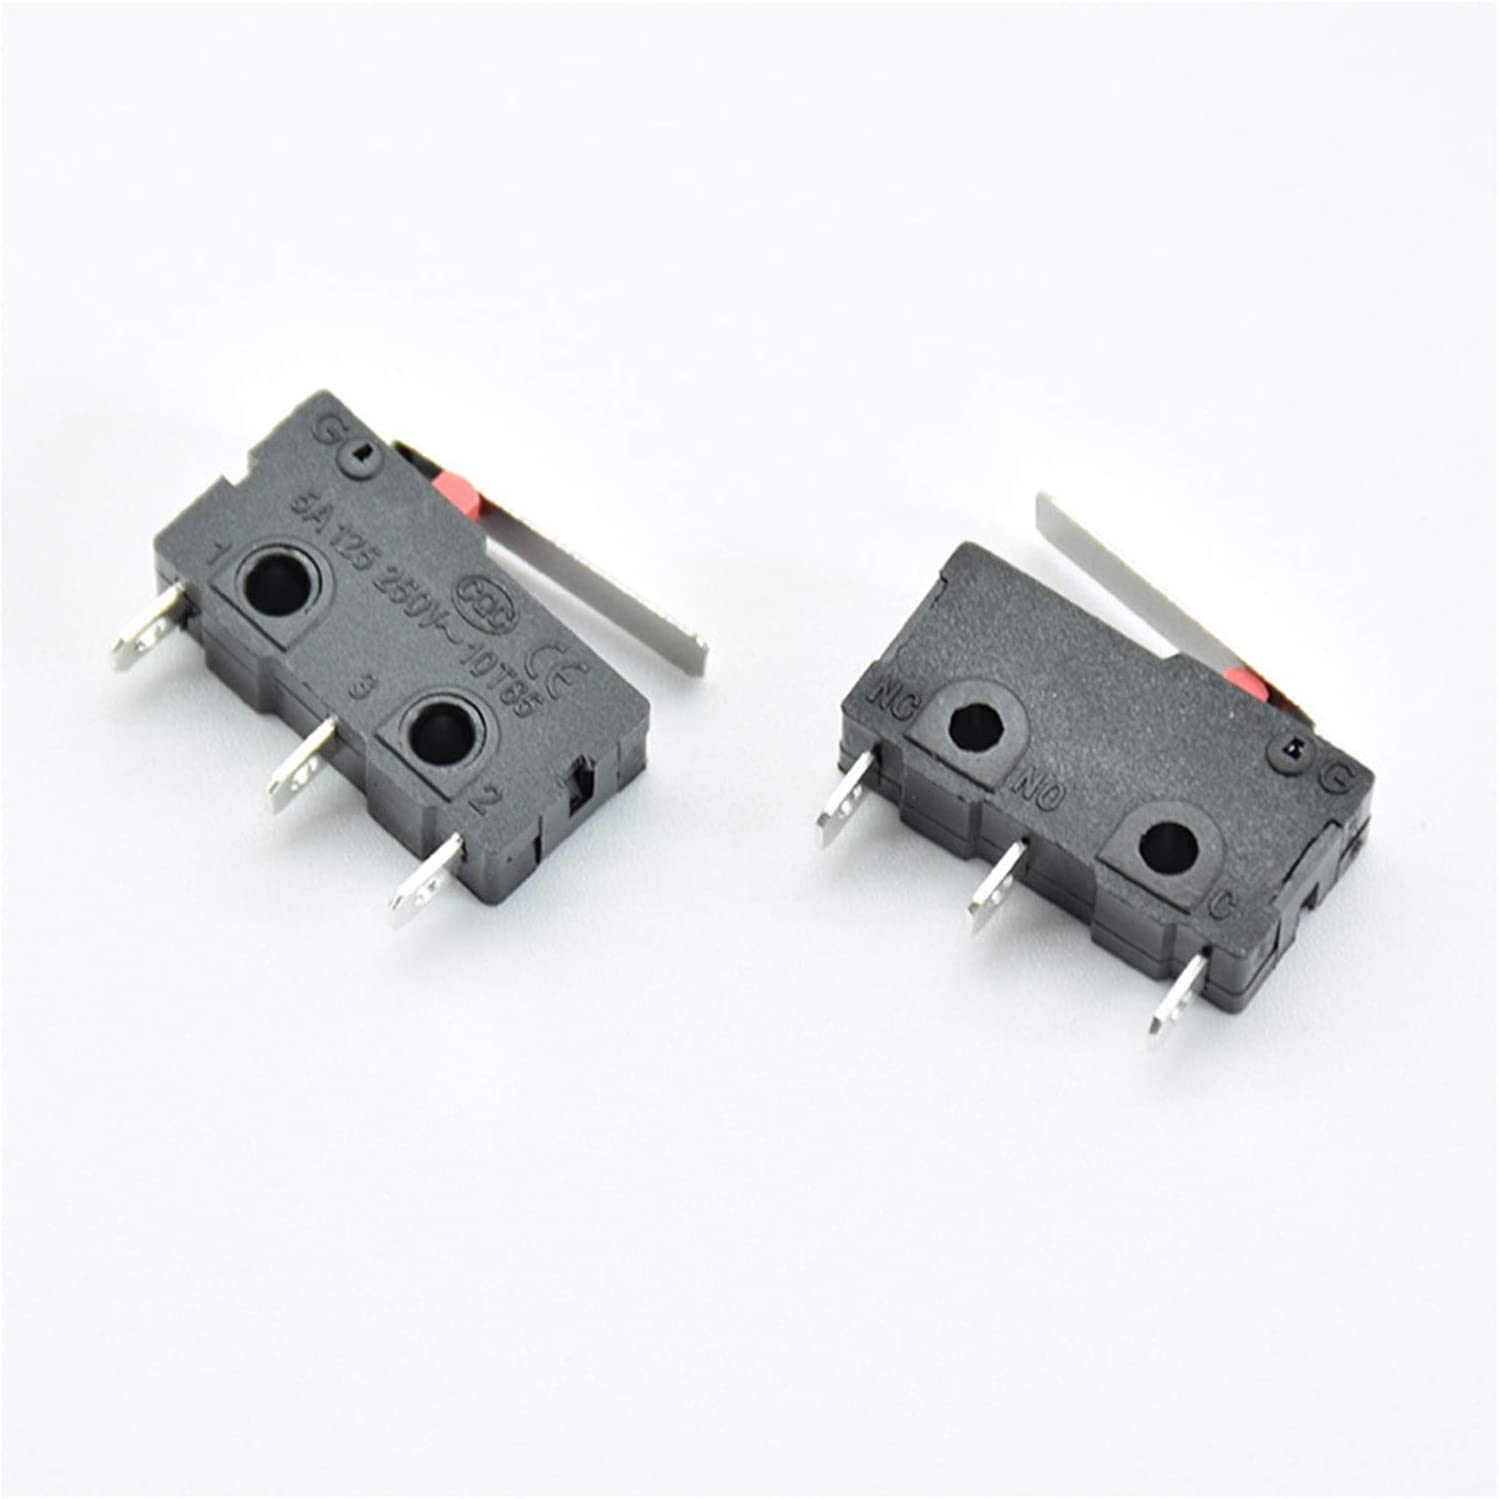 At the price Max 56% OFF XIALITR Micro Switch 5Pcs Mini Limit NC NO 3 P Pins